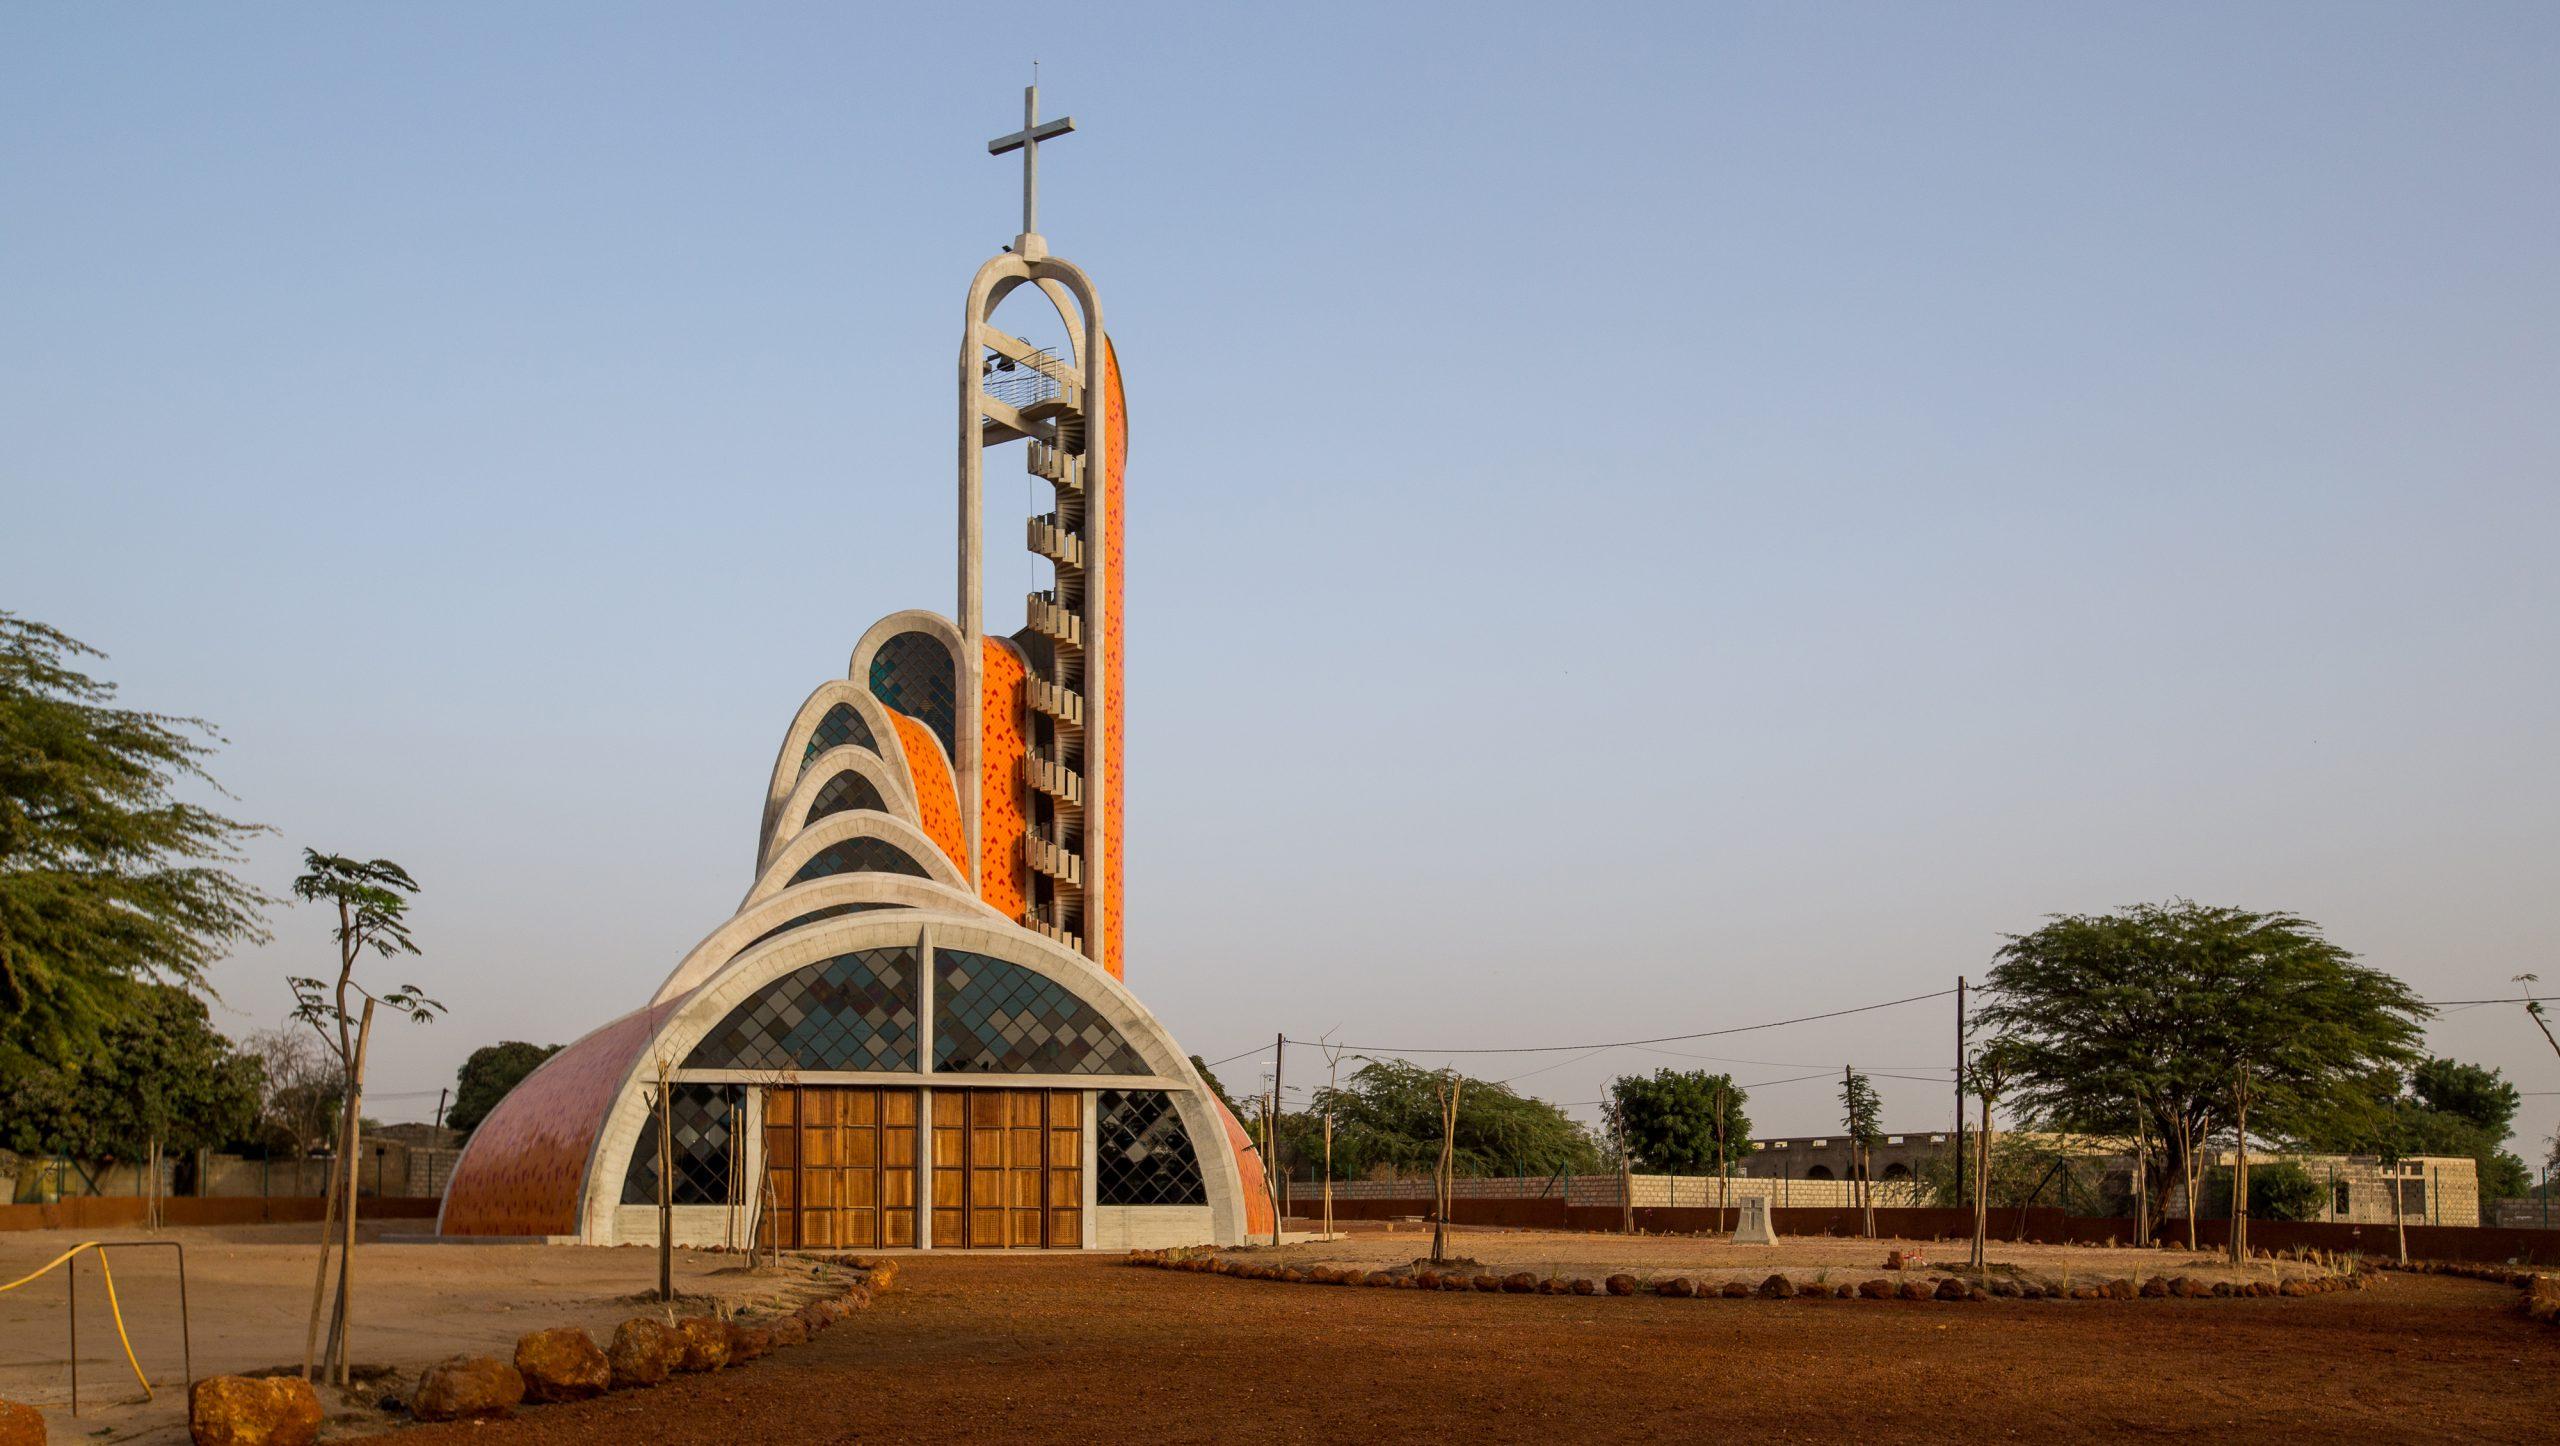 Eglise de l'Epiphanie